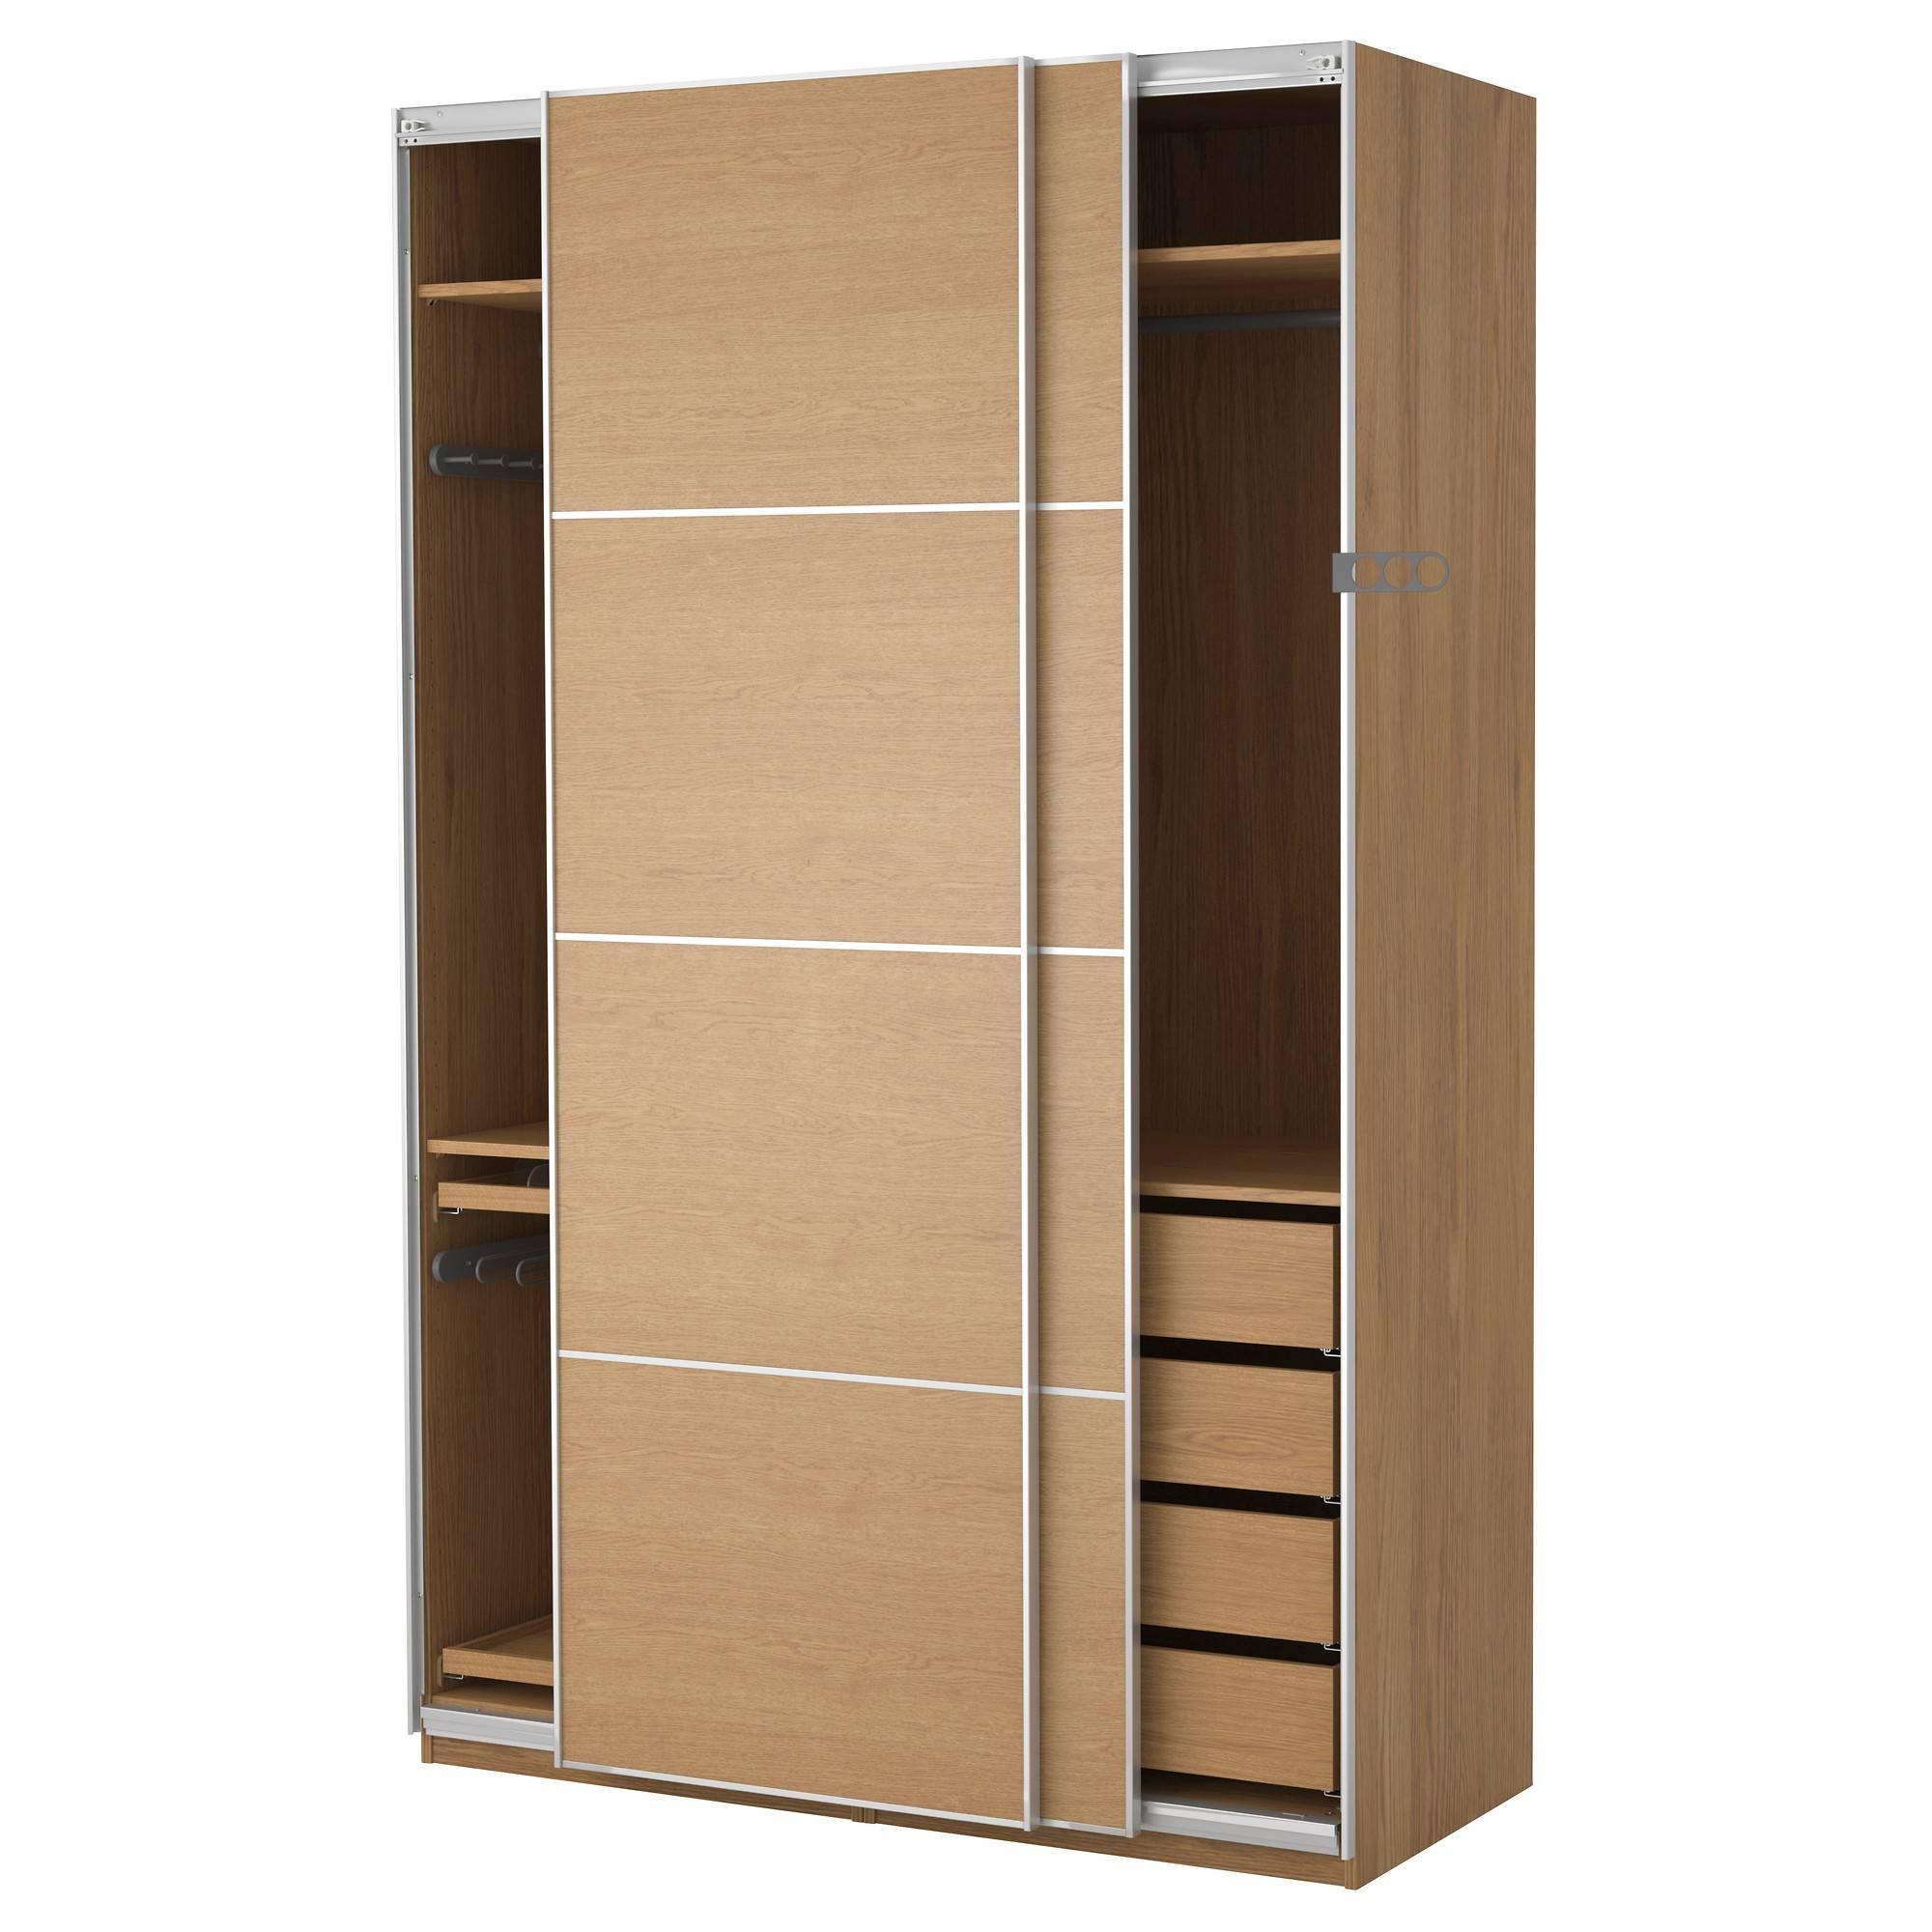 Natural Modern Wood Closet Doors | Roselawnlutheran intended for Dark Wood Wardrobe Doors (Image 21 of 30)